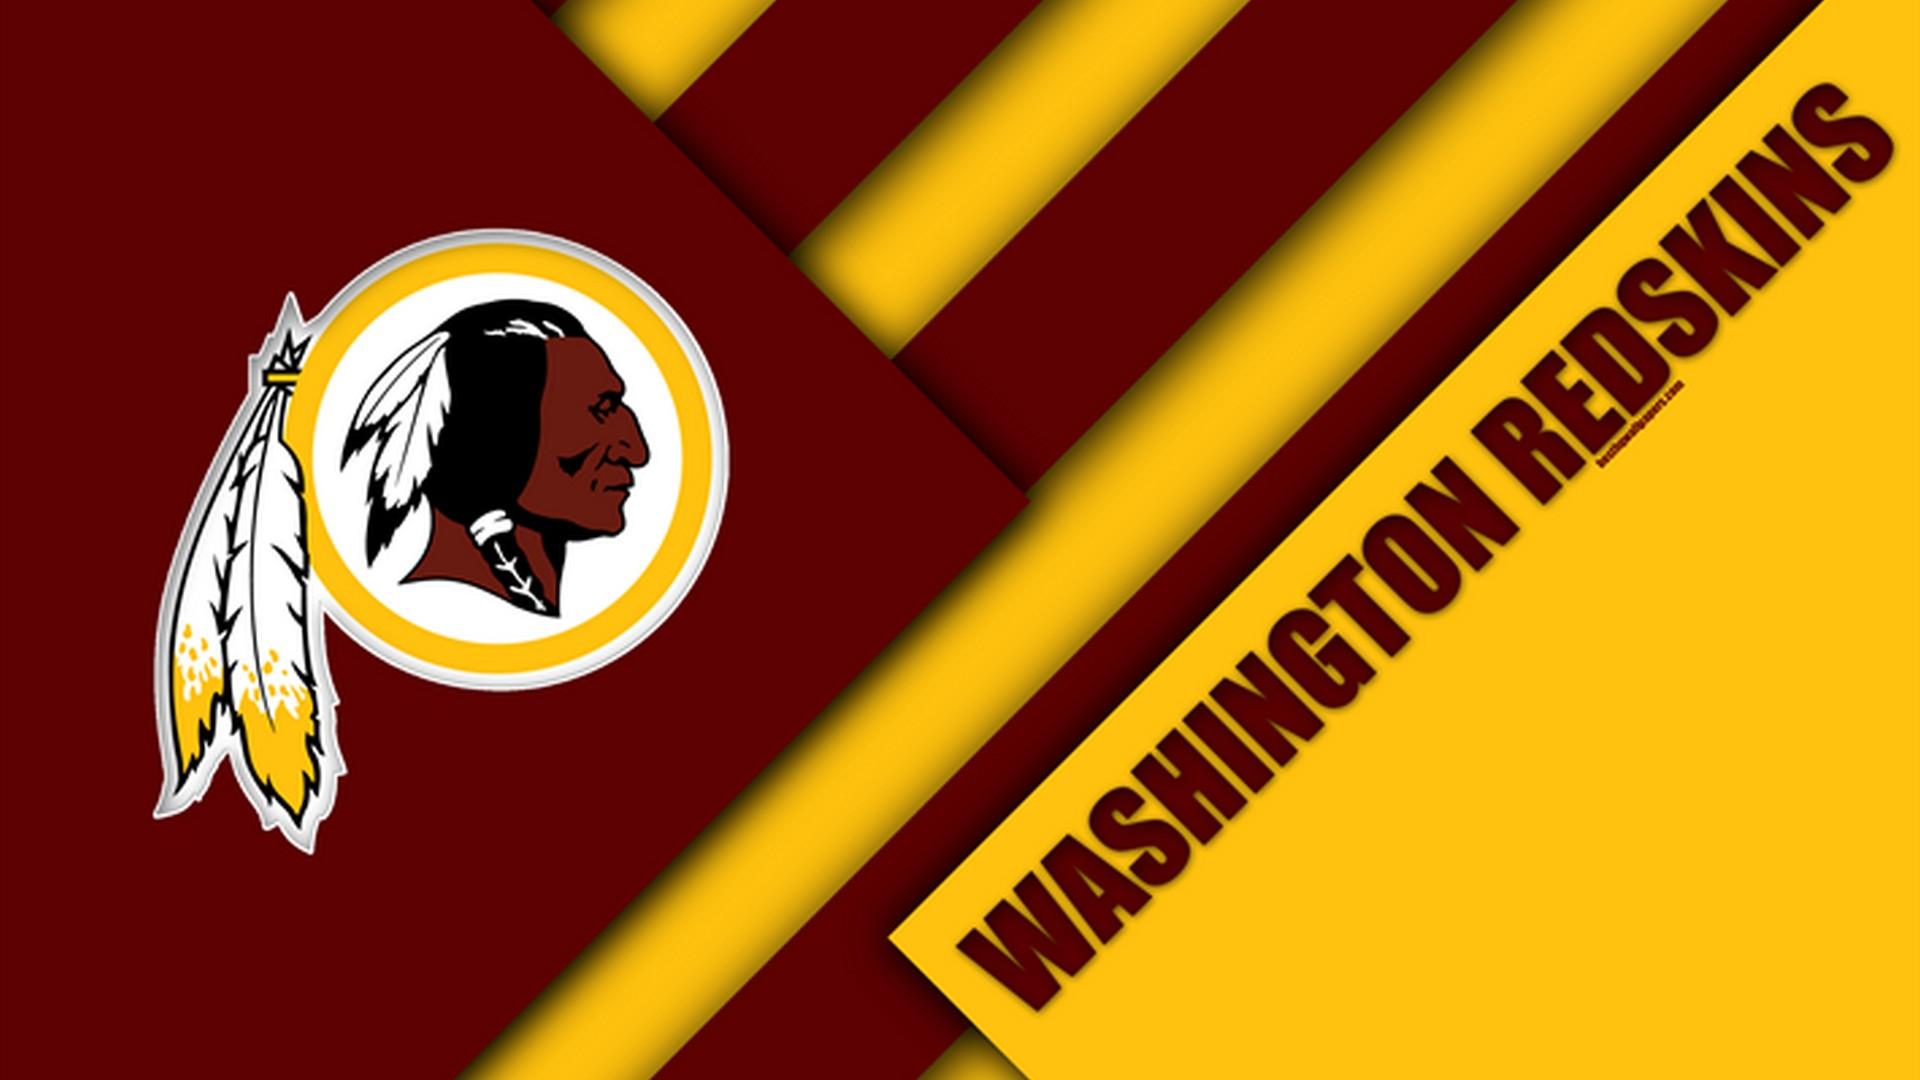 Washington Redskins Wallpaper 2020 NFL Football Wallpapers 1920x1080